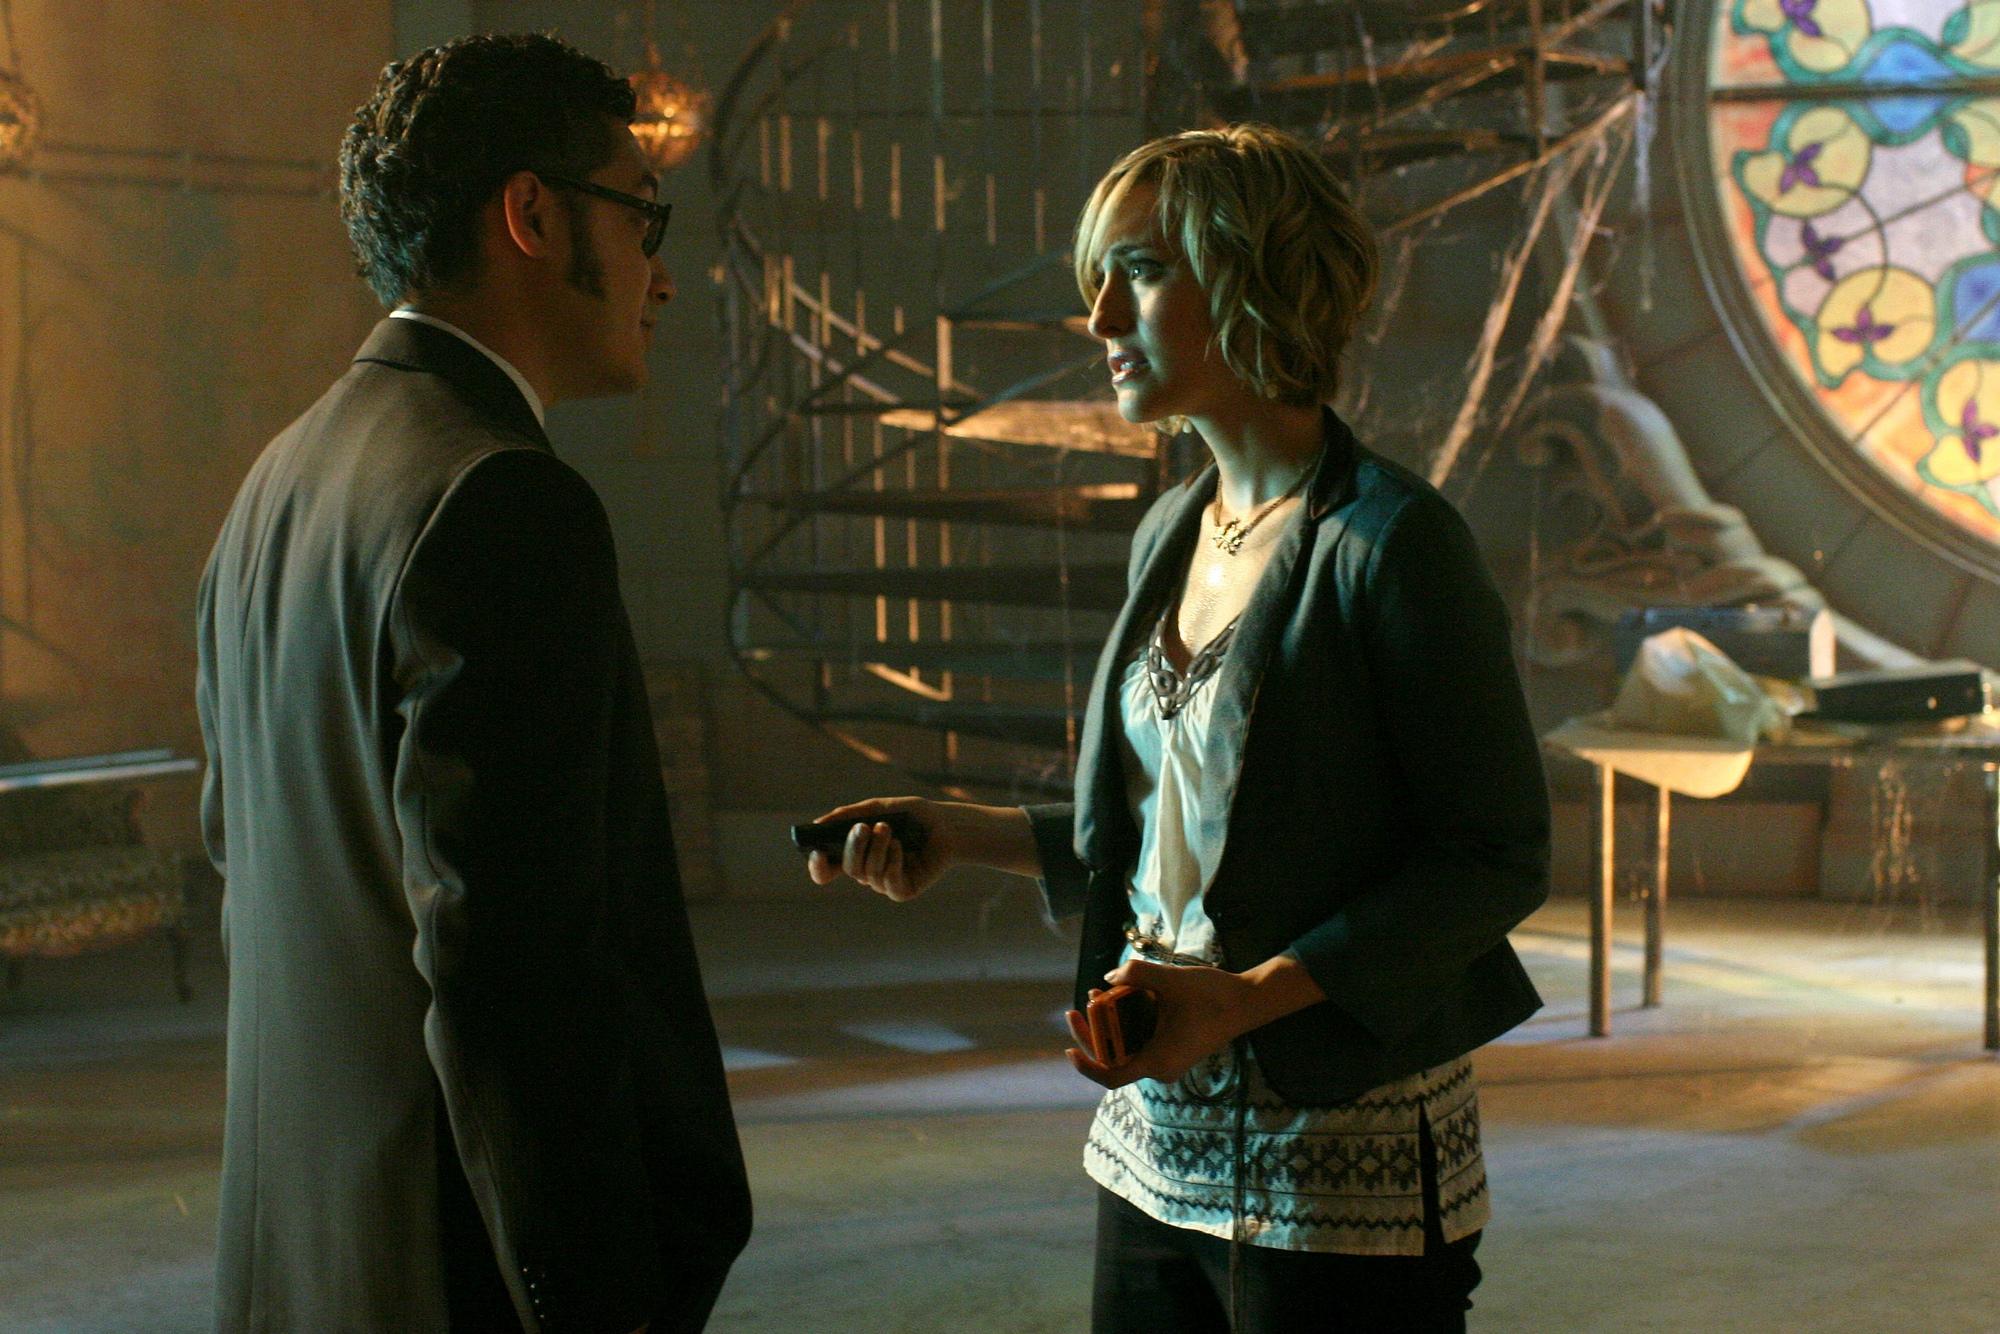 Smallville (TV Series) Episode: Savior